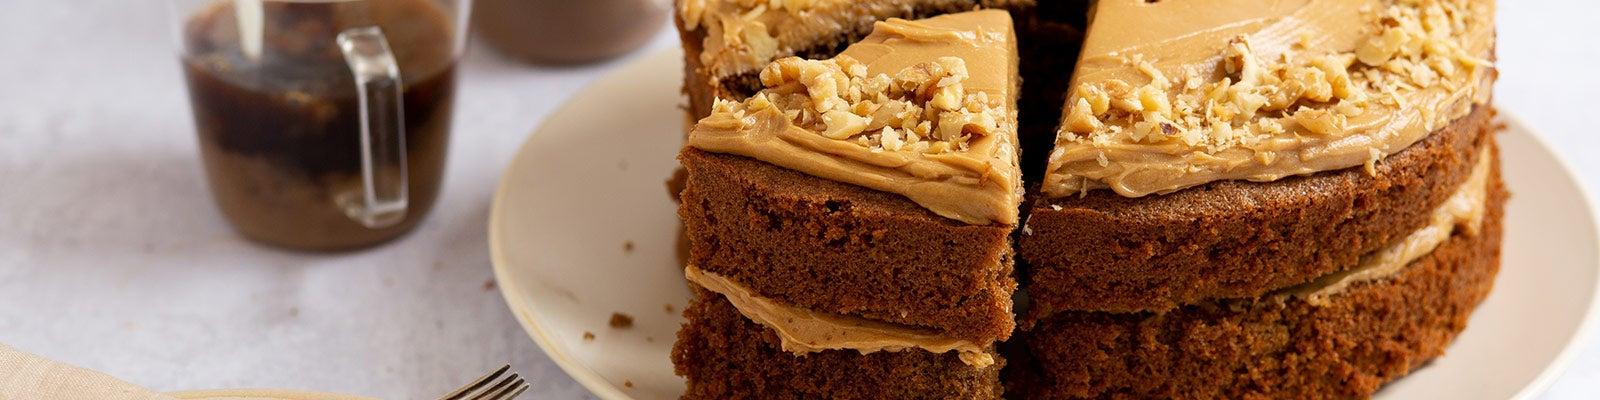 coffee-walnut-cake-recipe-header-desktop